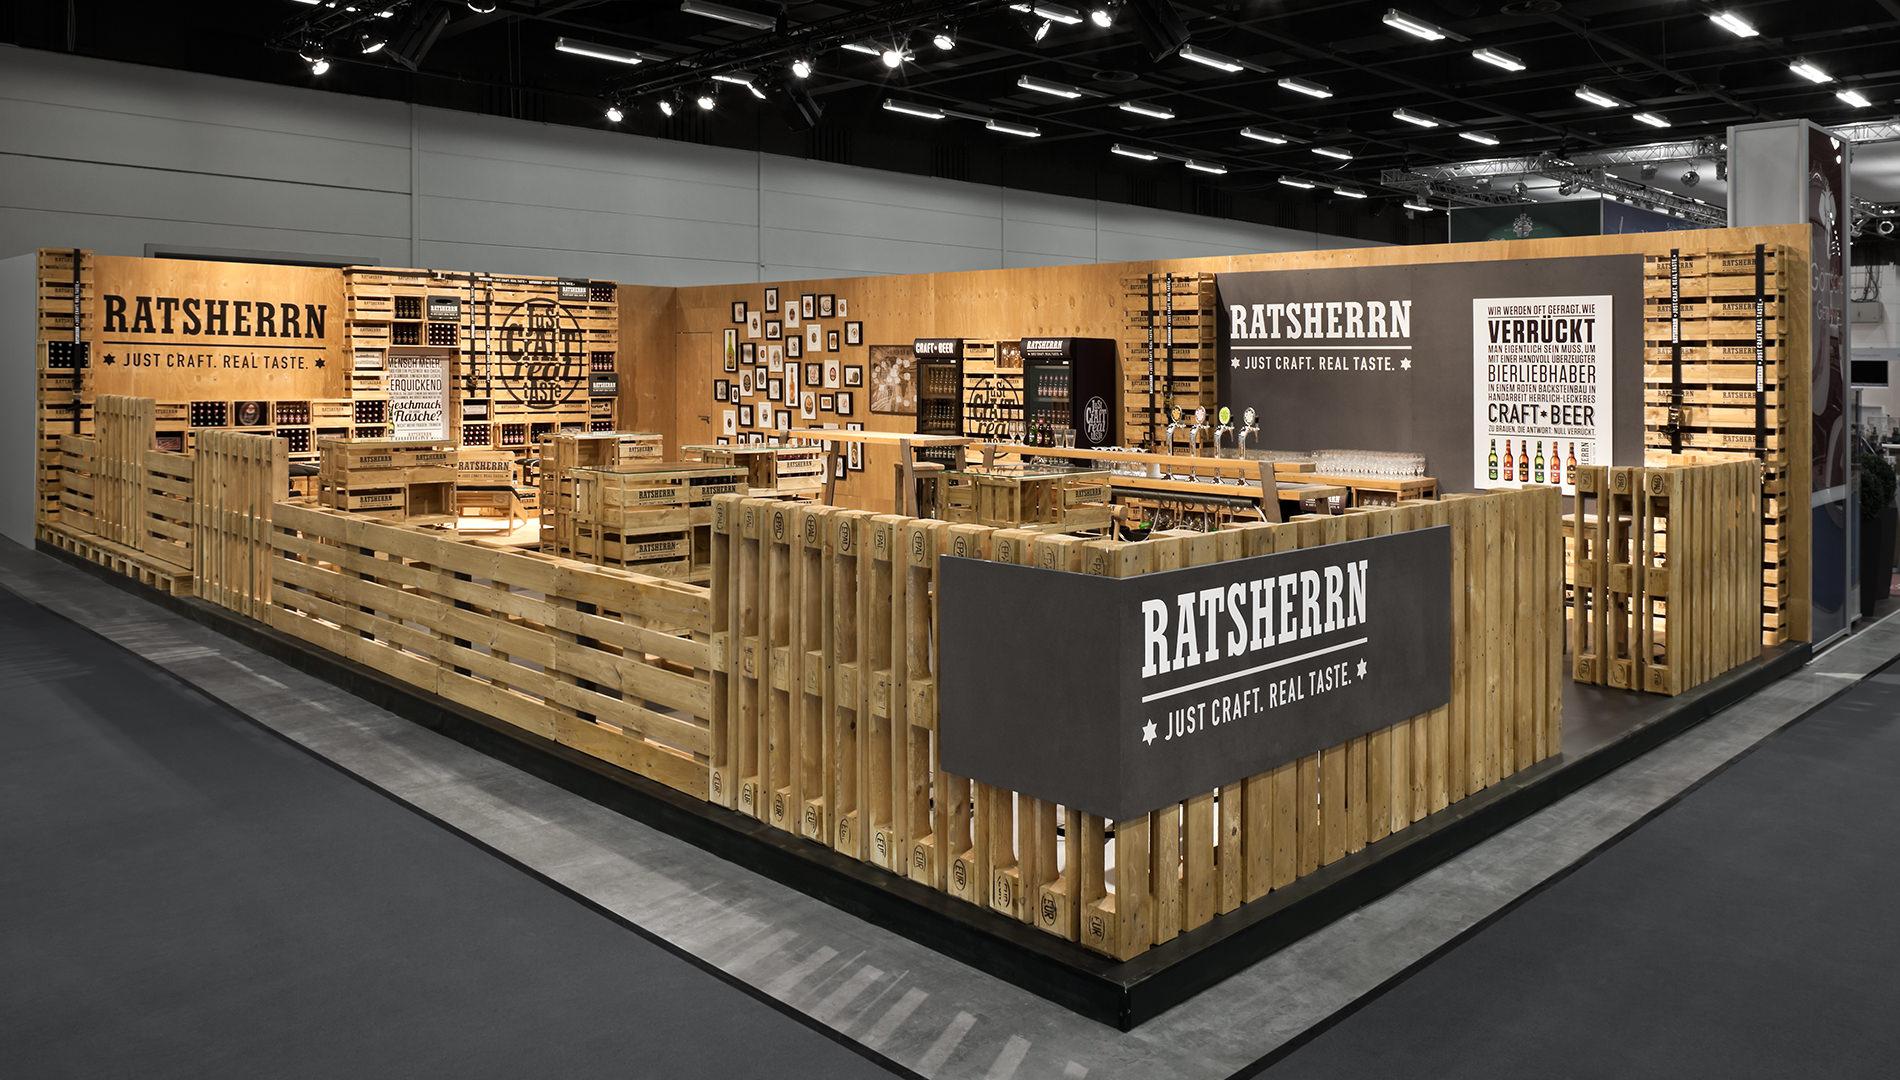 Messe Design Live Kommunikation Hamburg Internorga Ratsherrn Corporate Architecture Messestand Going Places EventLabs